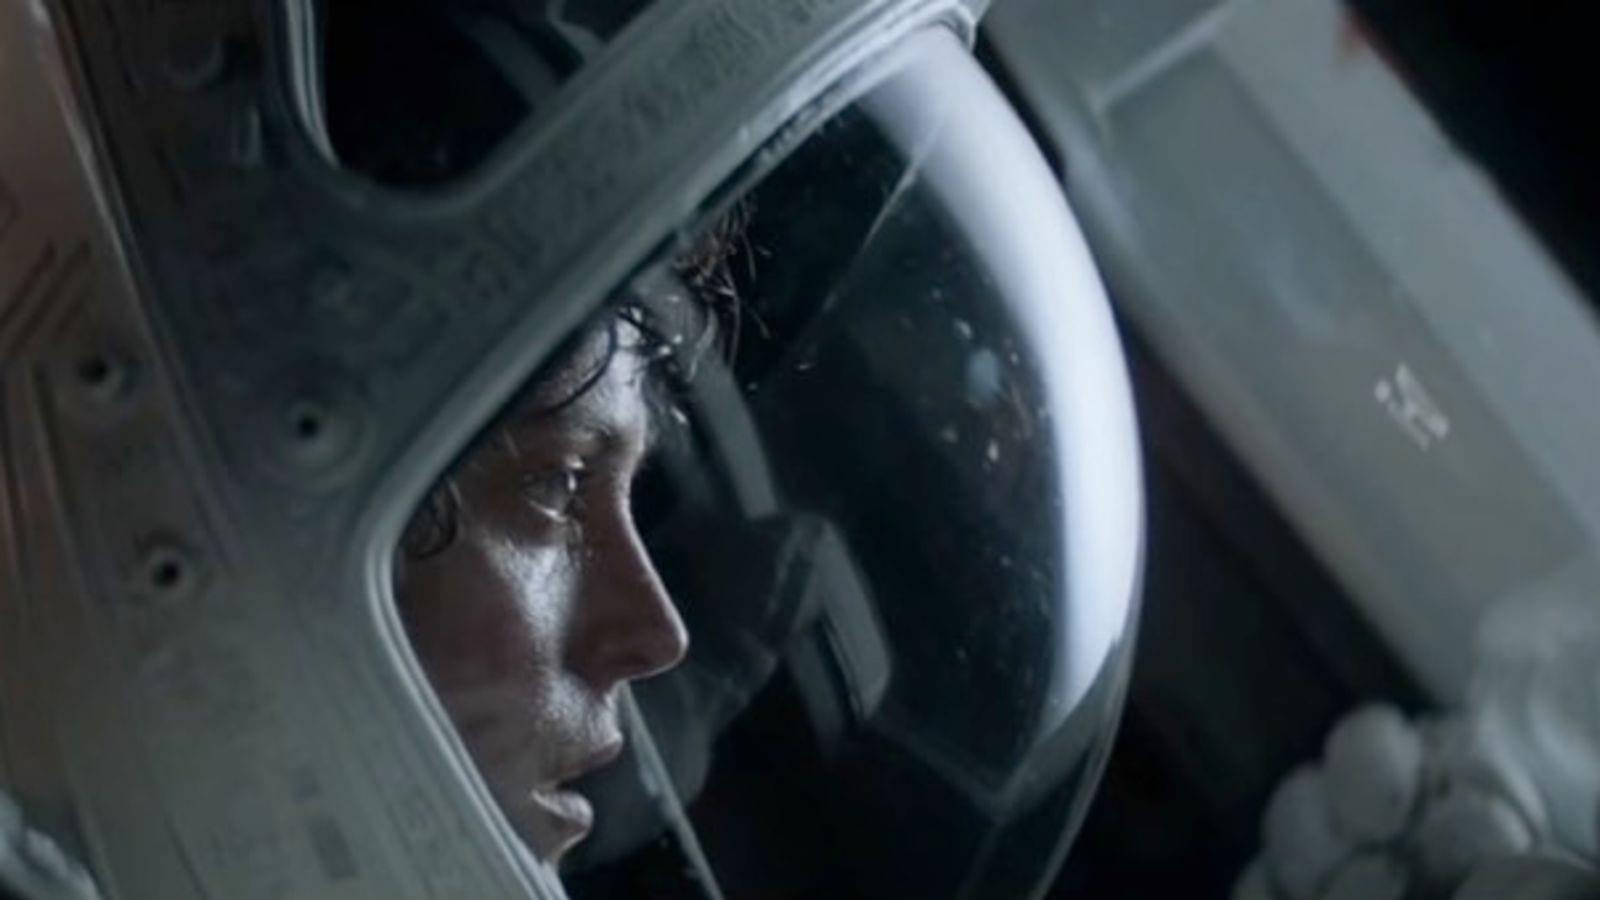 Ripley escapes a self-destructing ship in the final scene of Alien